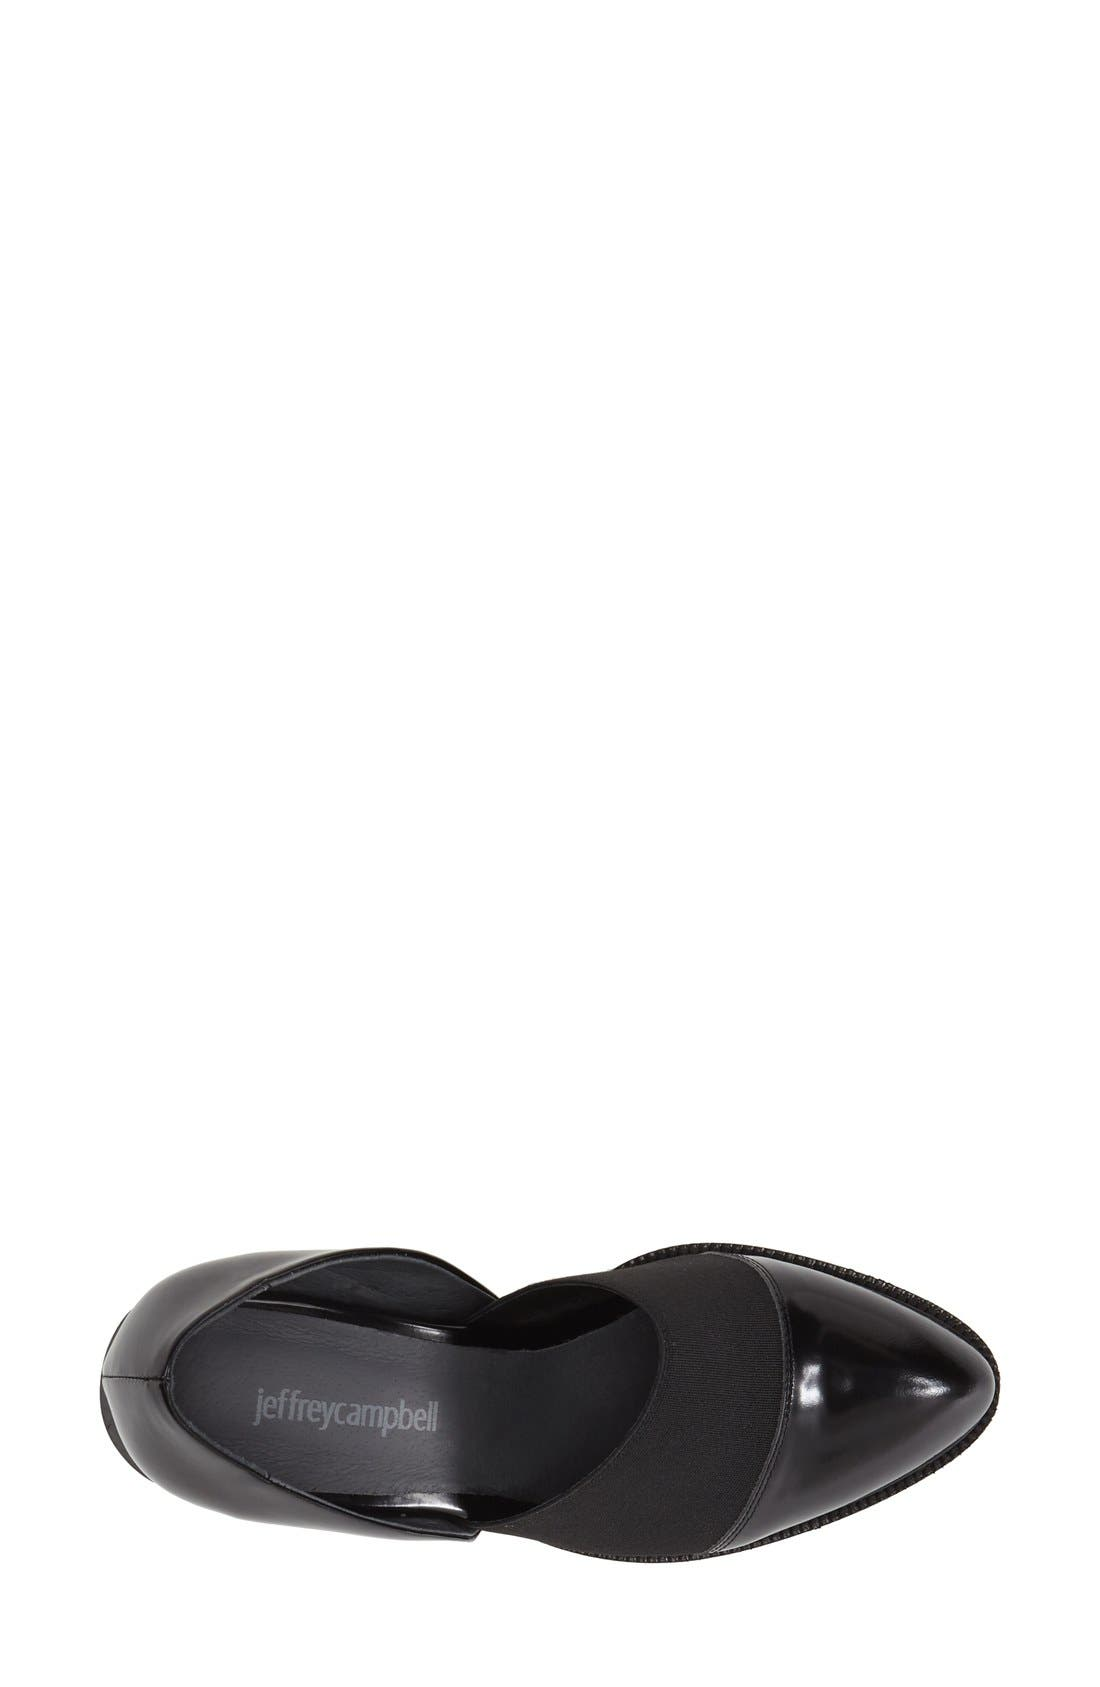 Alternate Image 3  - Jeffrey Campbell 'Shriver' Almond Toe Loafer (Women)